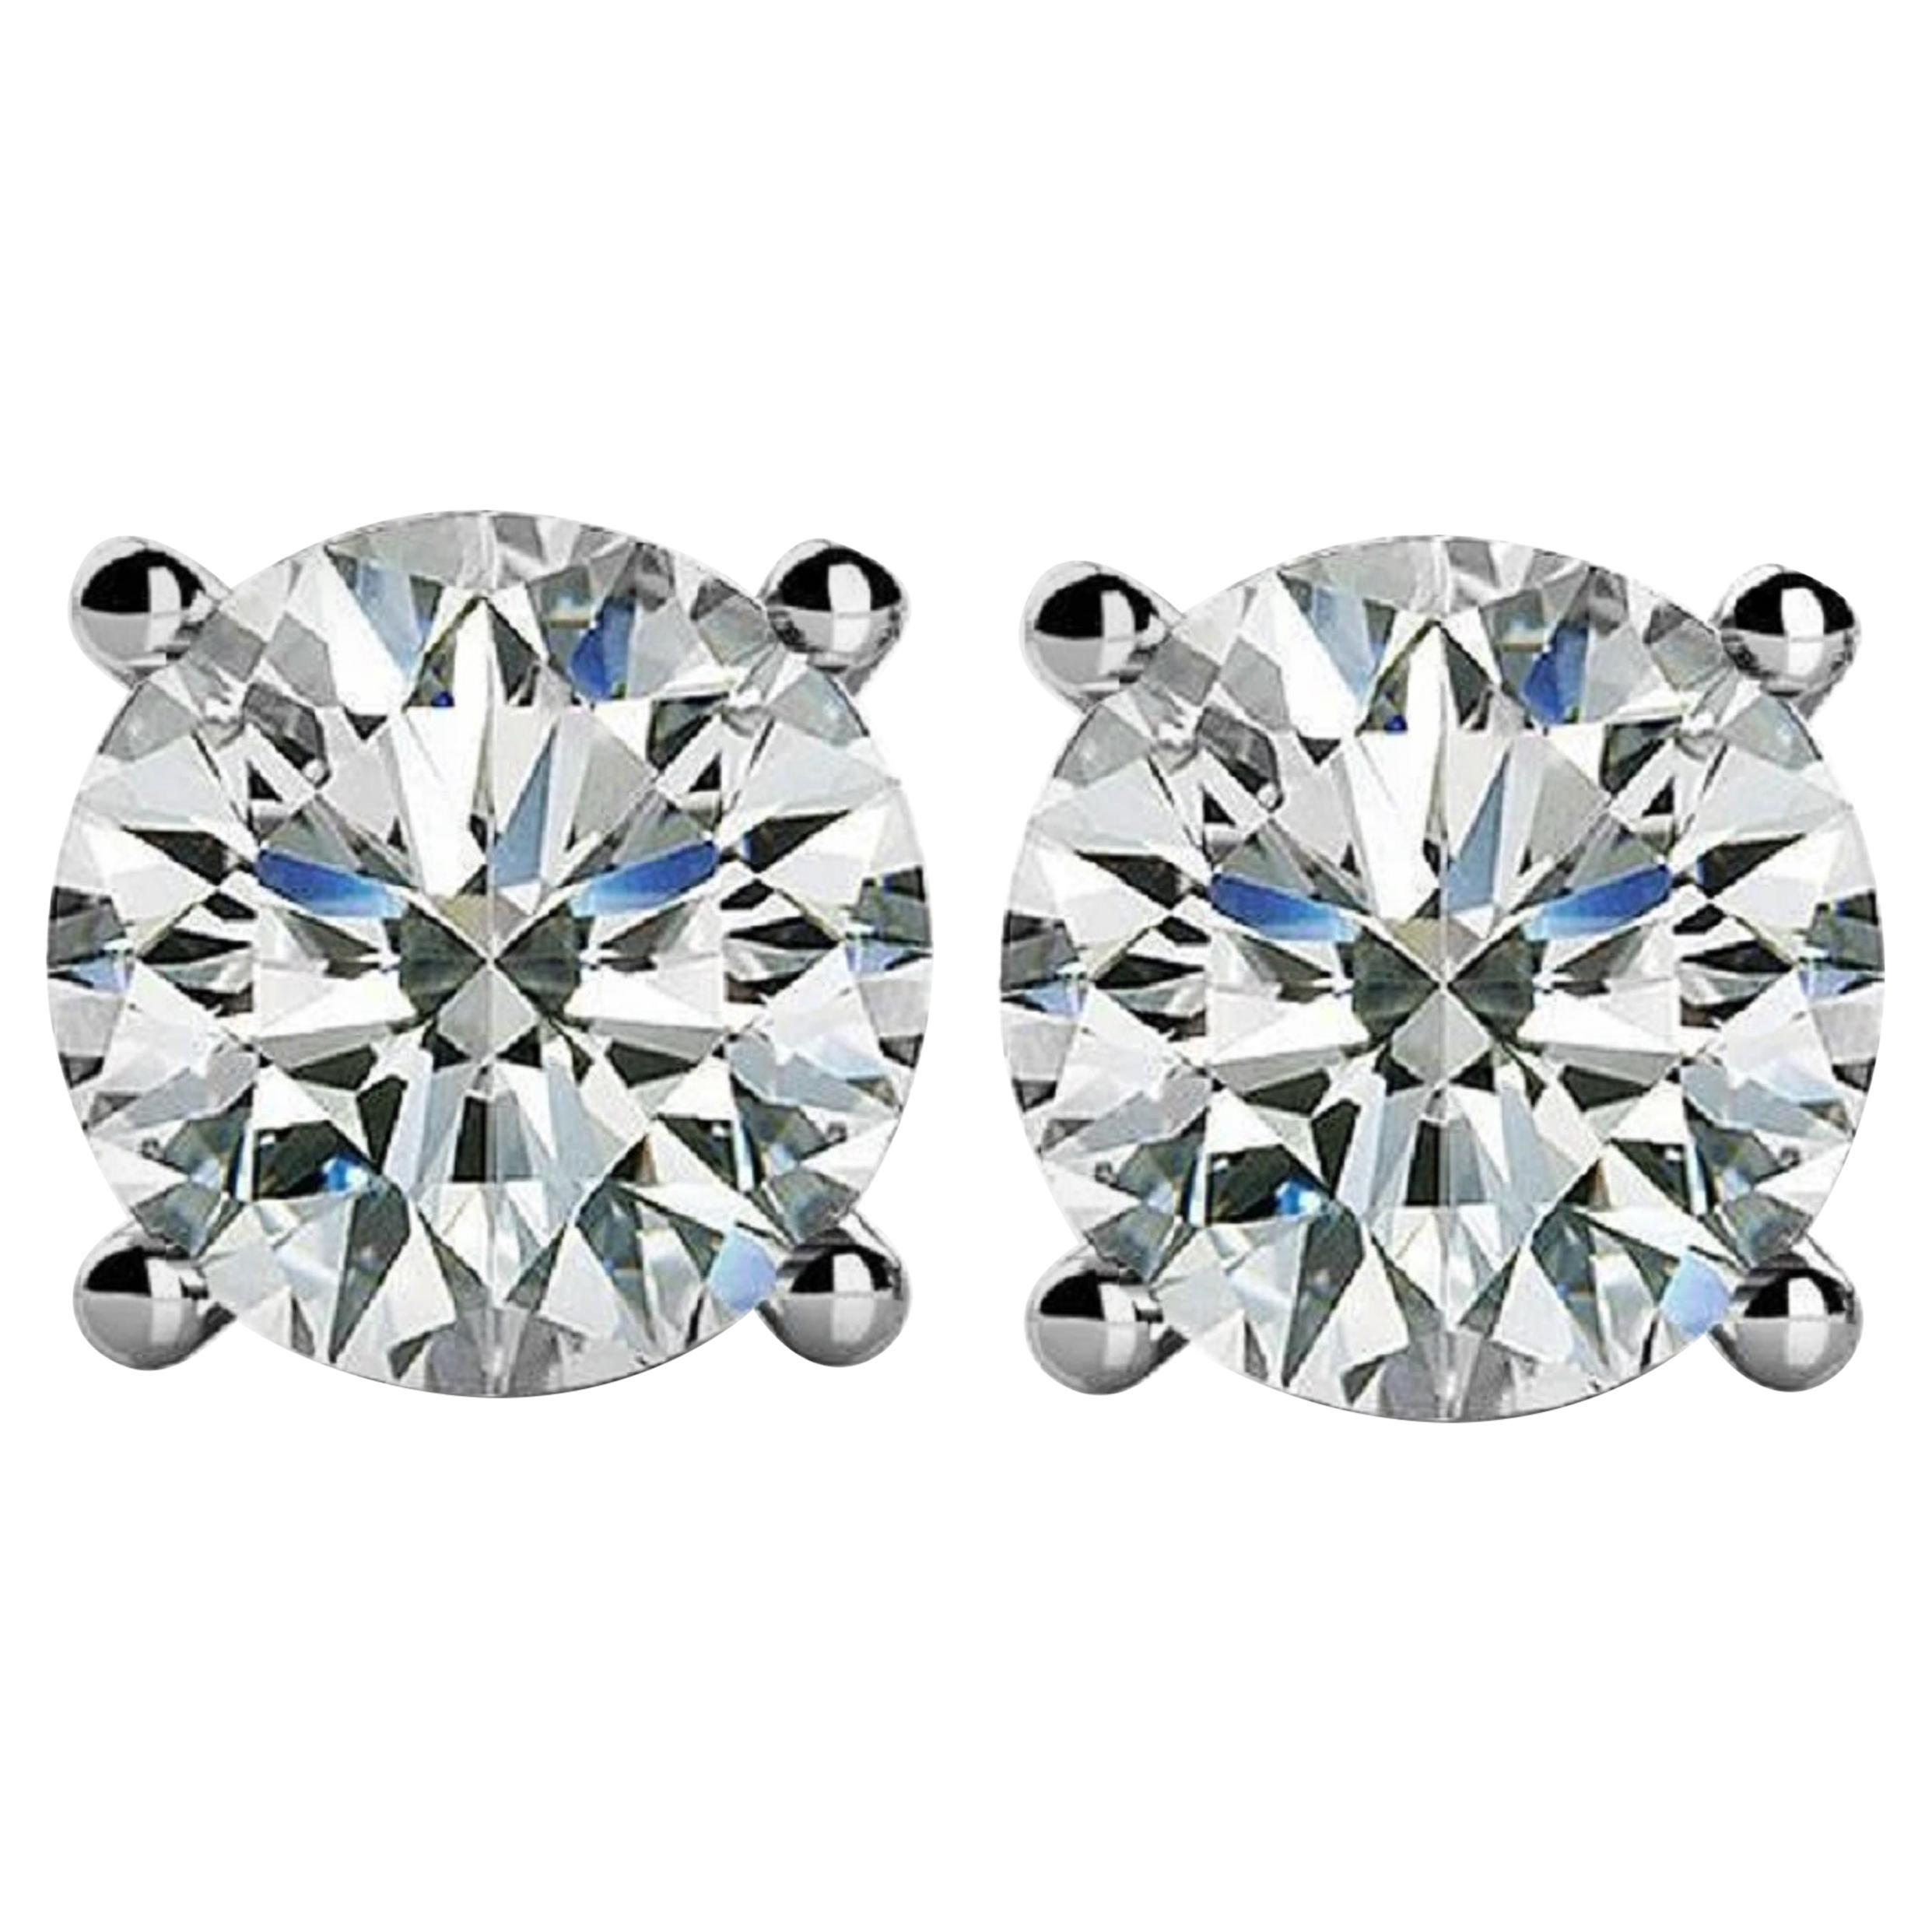 INTERNALLY FLAWLESS D Color GIA Certified 2 Carat Diamond Studs